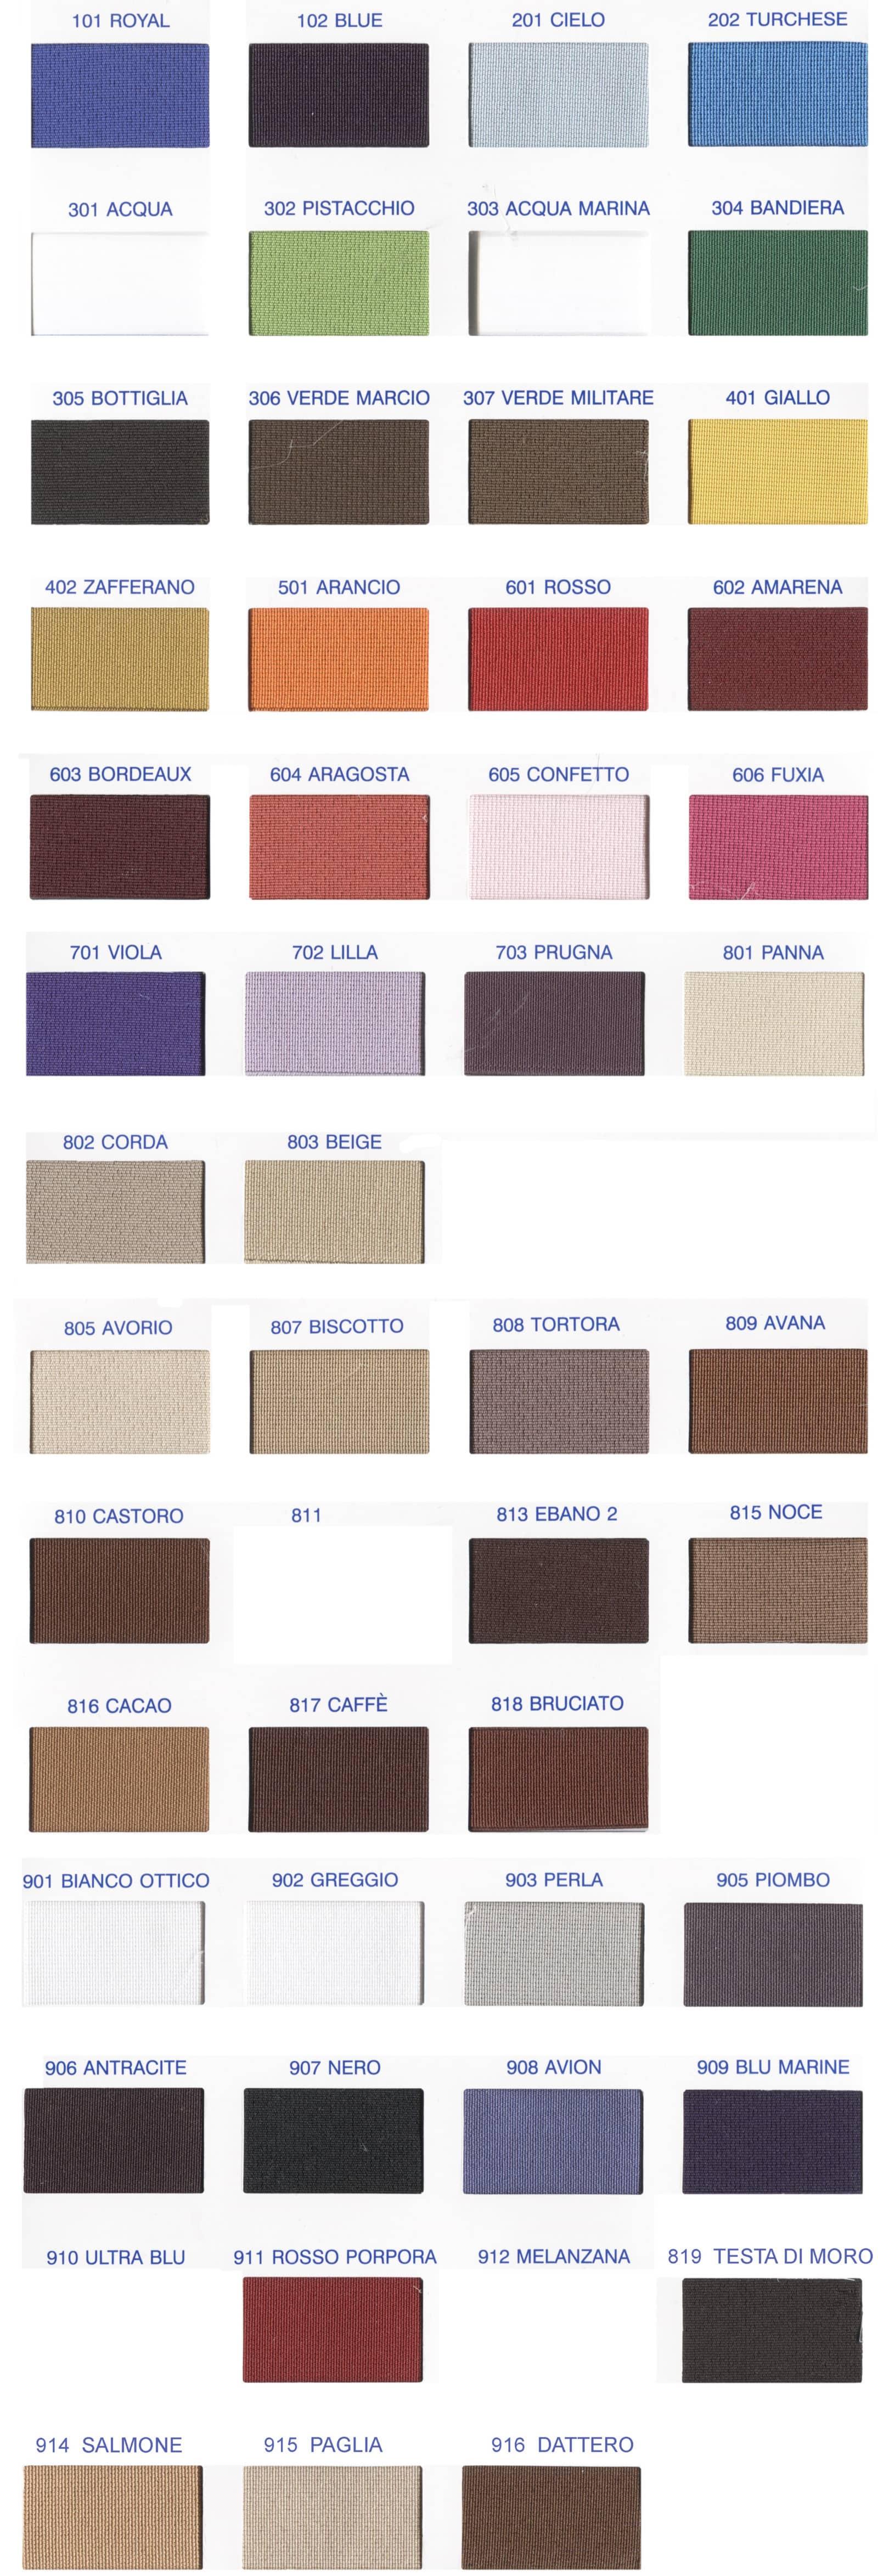 Cartella colori elastico 810